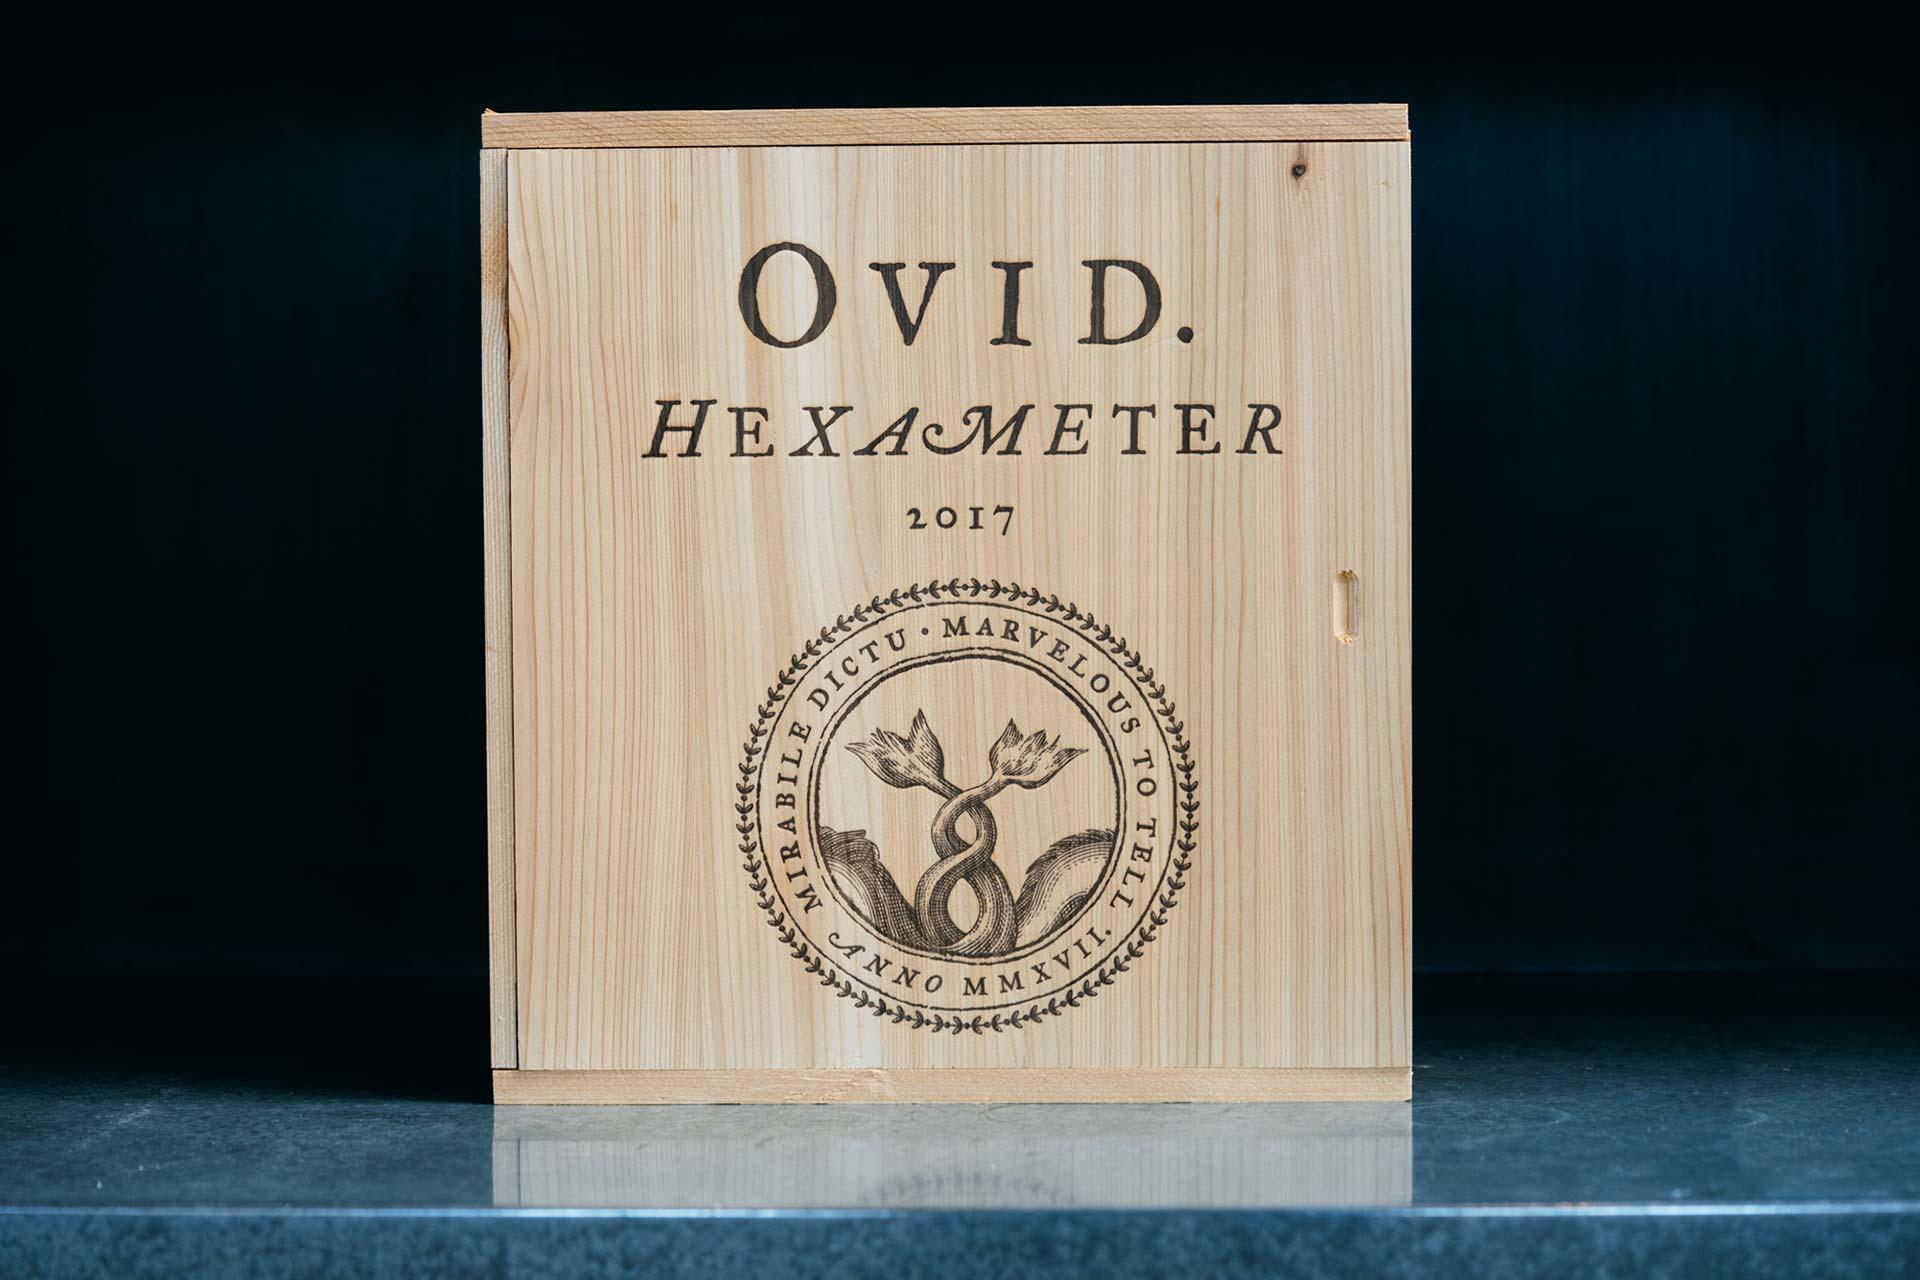 2017 OVID Hexameter in wood box